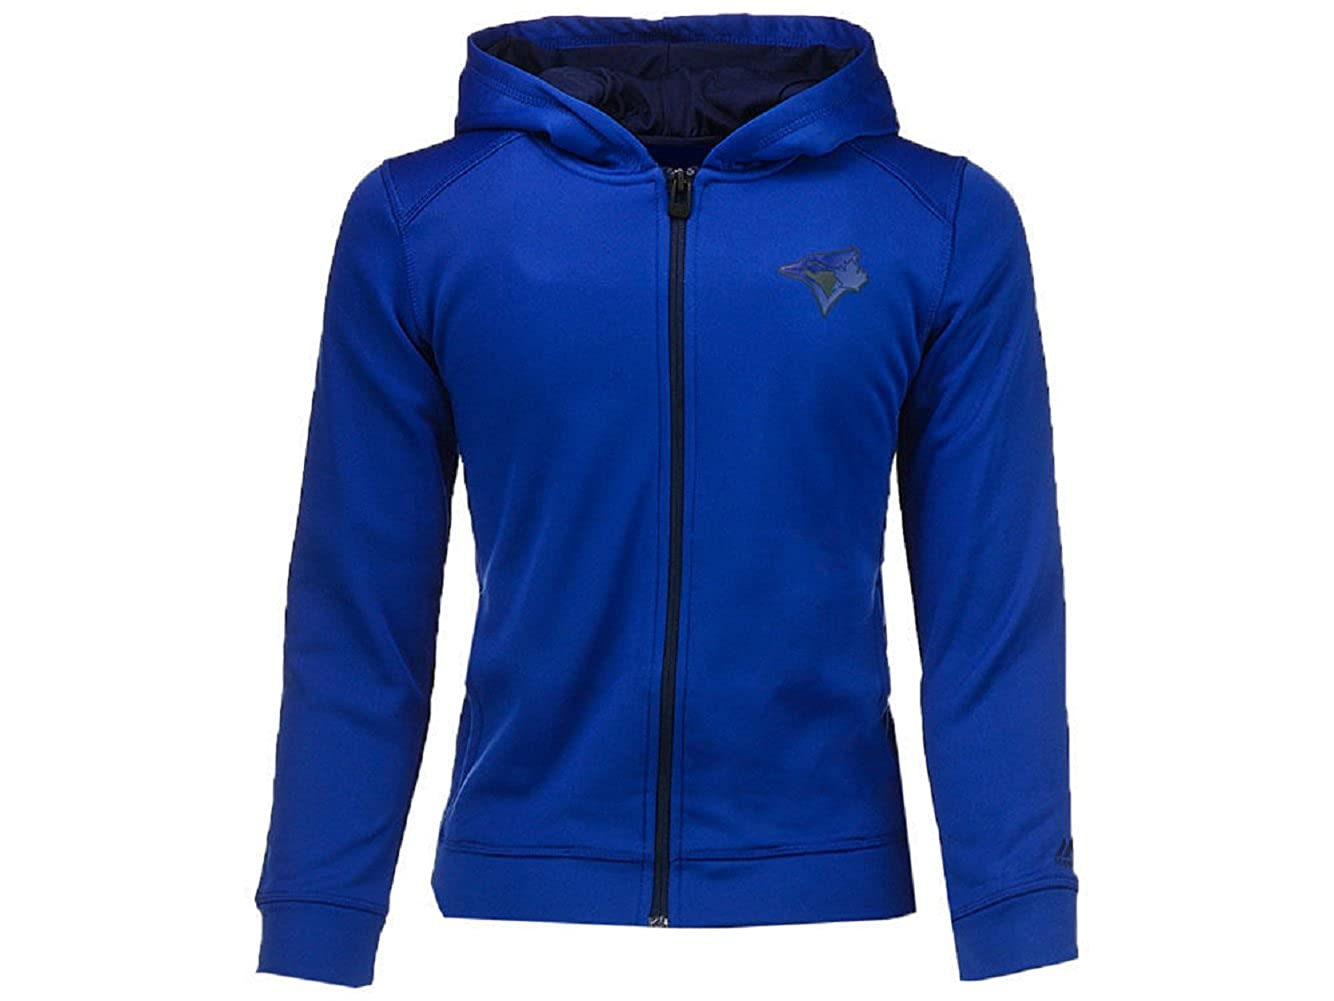 Toronto Blue Jays Majestic MLB Youth Club Full Zip Hoodie New #20915477 - Size Small Aeropostale